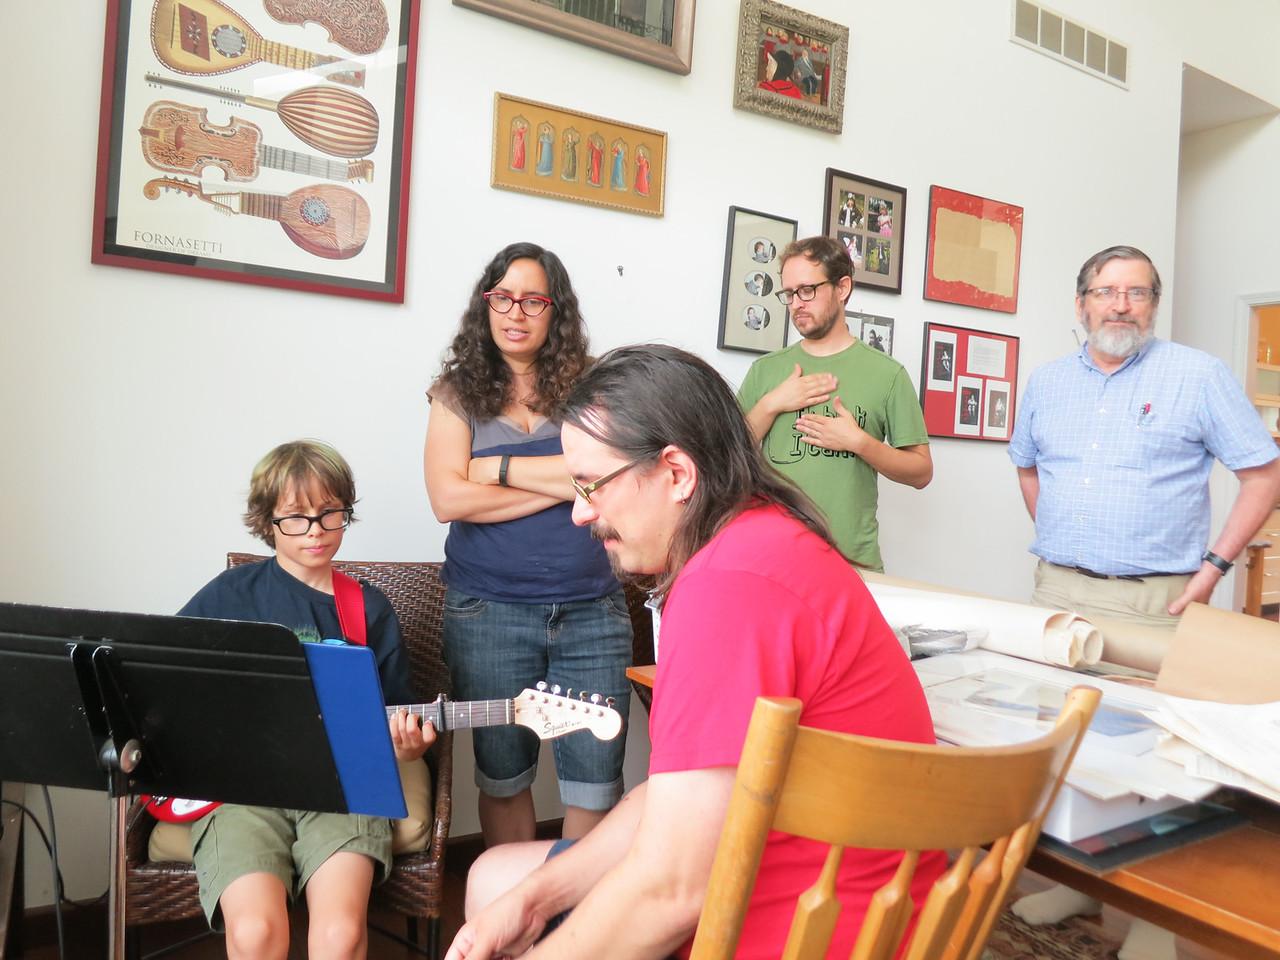 <big>Here, Grandpa surveys with great satisfaction his children & grandson making music together.</big>